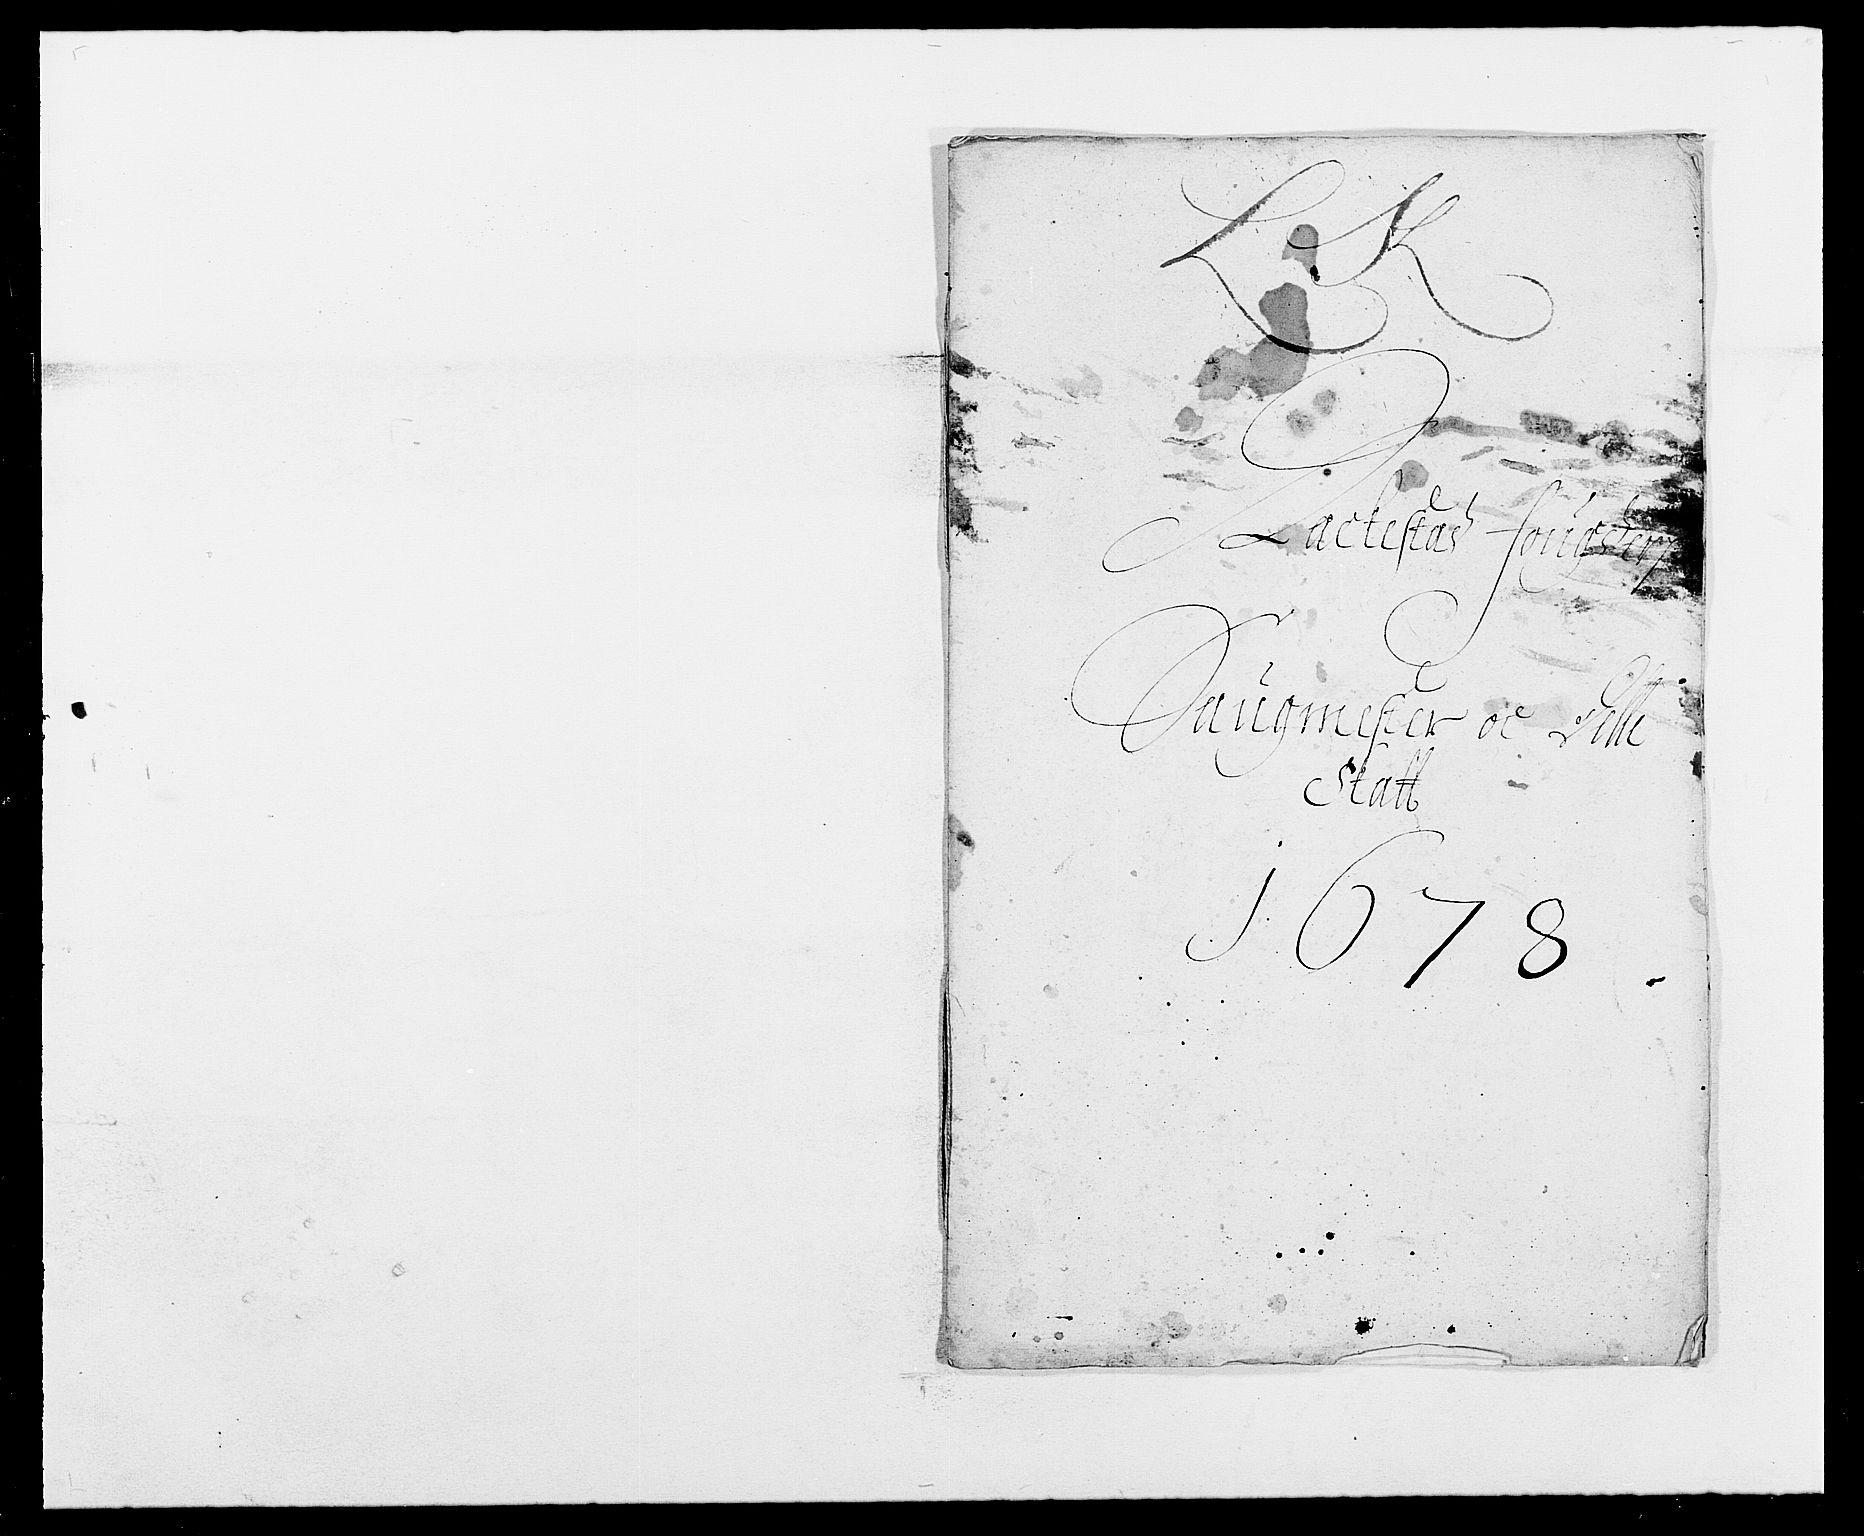 RA, Rentekammeret inntil 1814, Reviderte regnskaper, Fogderegnskap, R05/L0271: Fogderegnskap Rakkestad, 1678-1679, s. 243